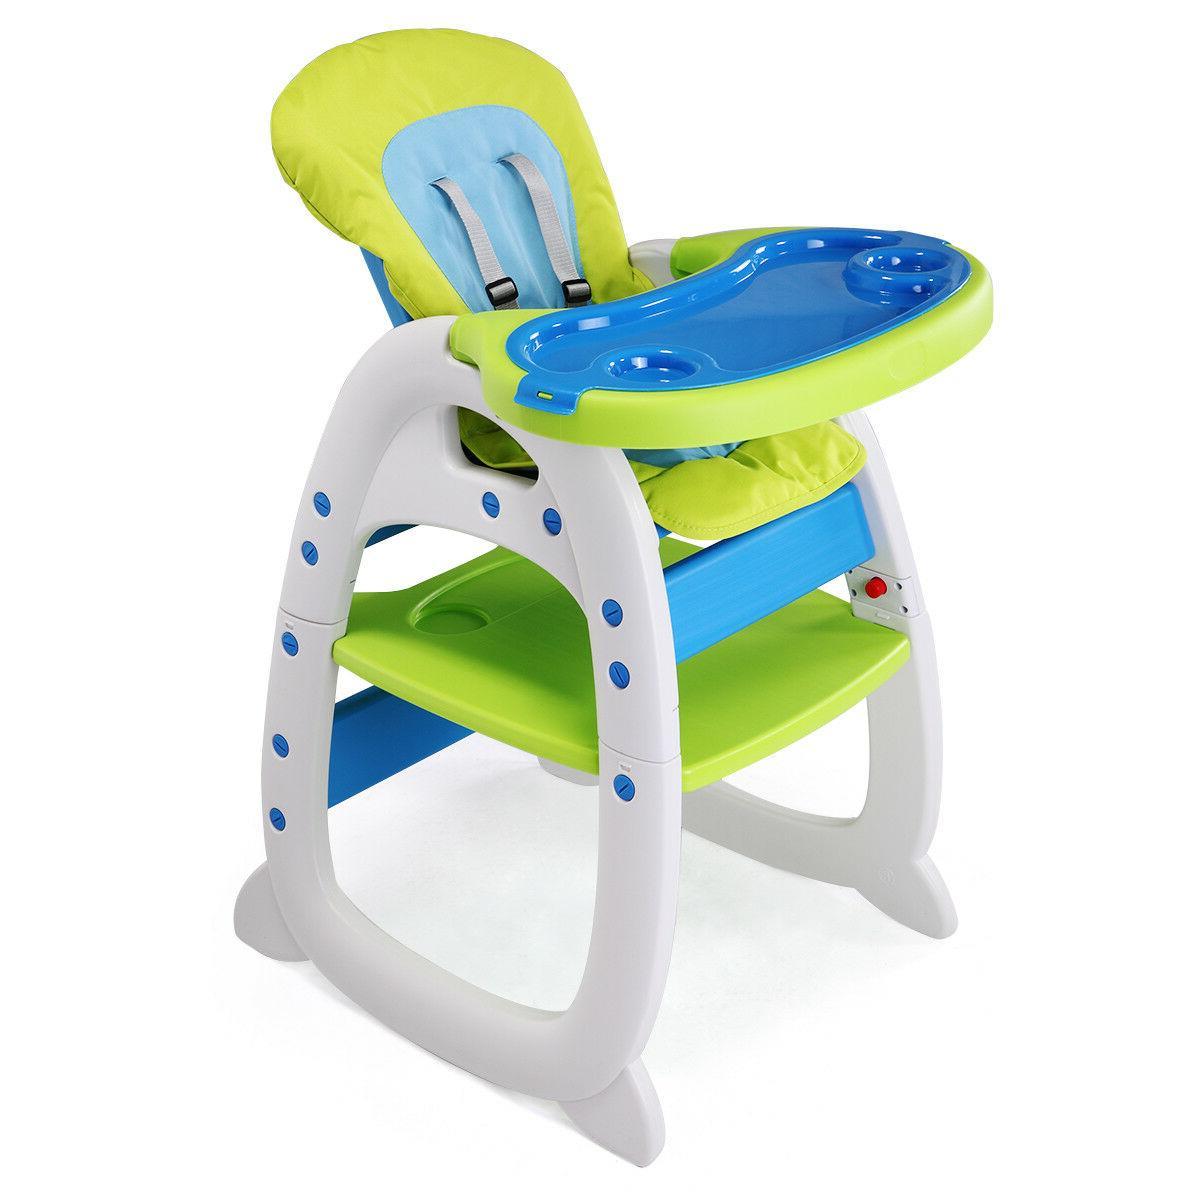 3 High Chair Play Booster Toddler Feeding Blue-green